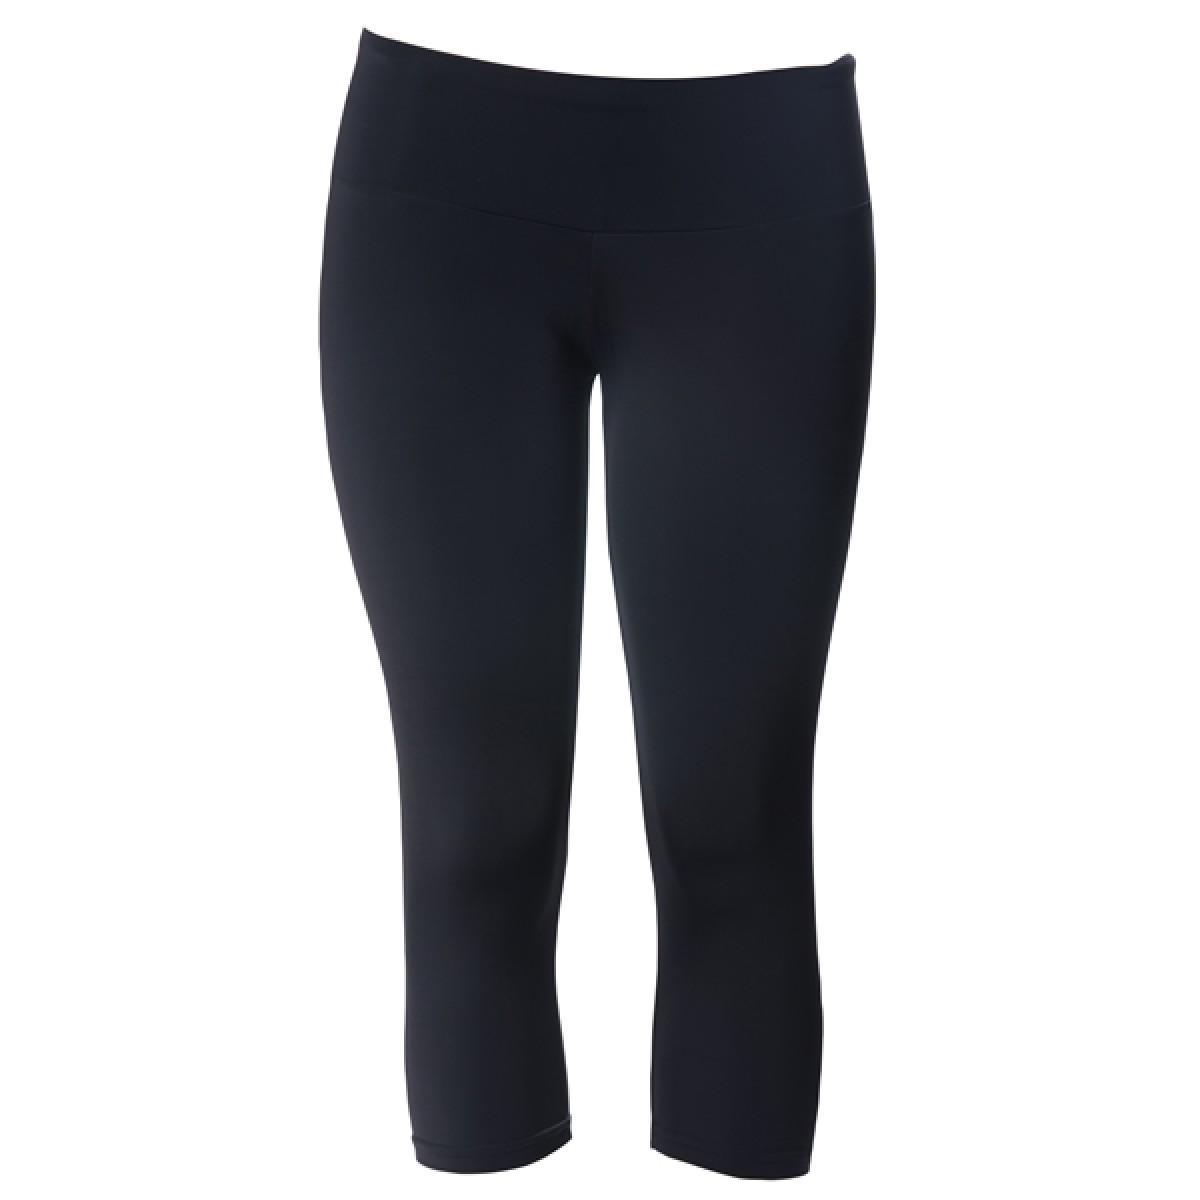 Calça Legging Anti - Celulite  - MagnePhoton